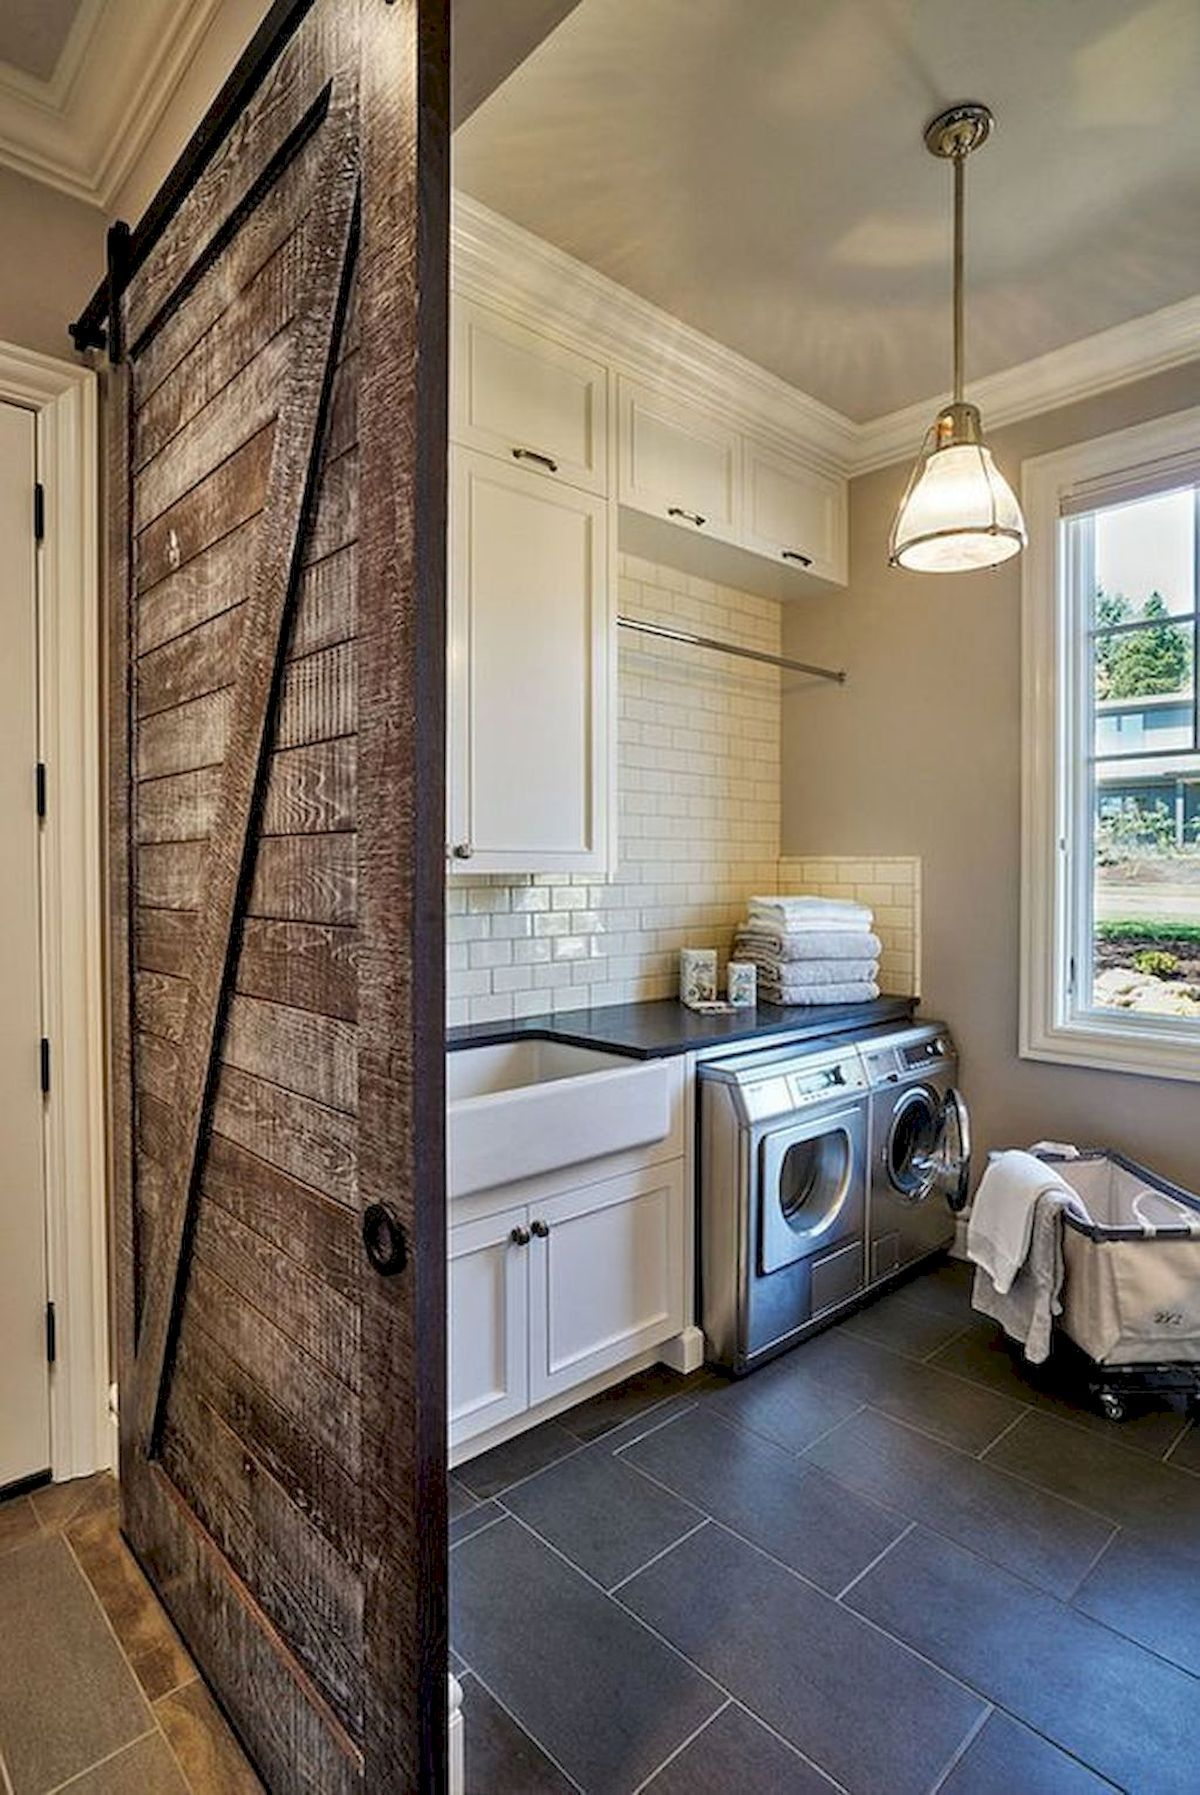 Efficient Laundry Room Designs images